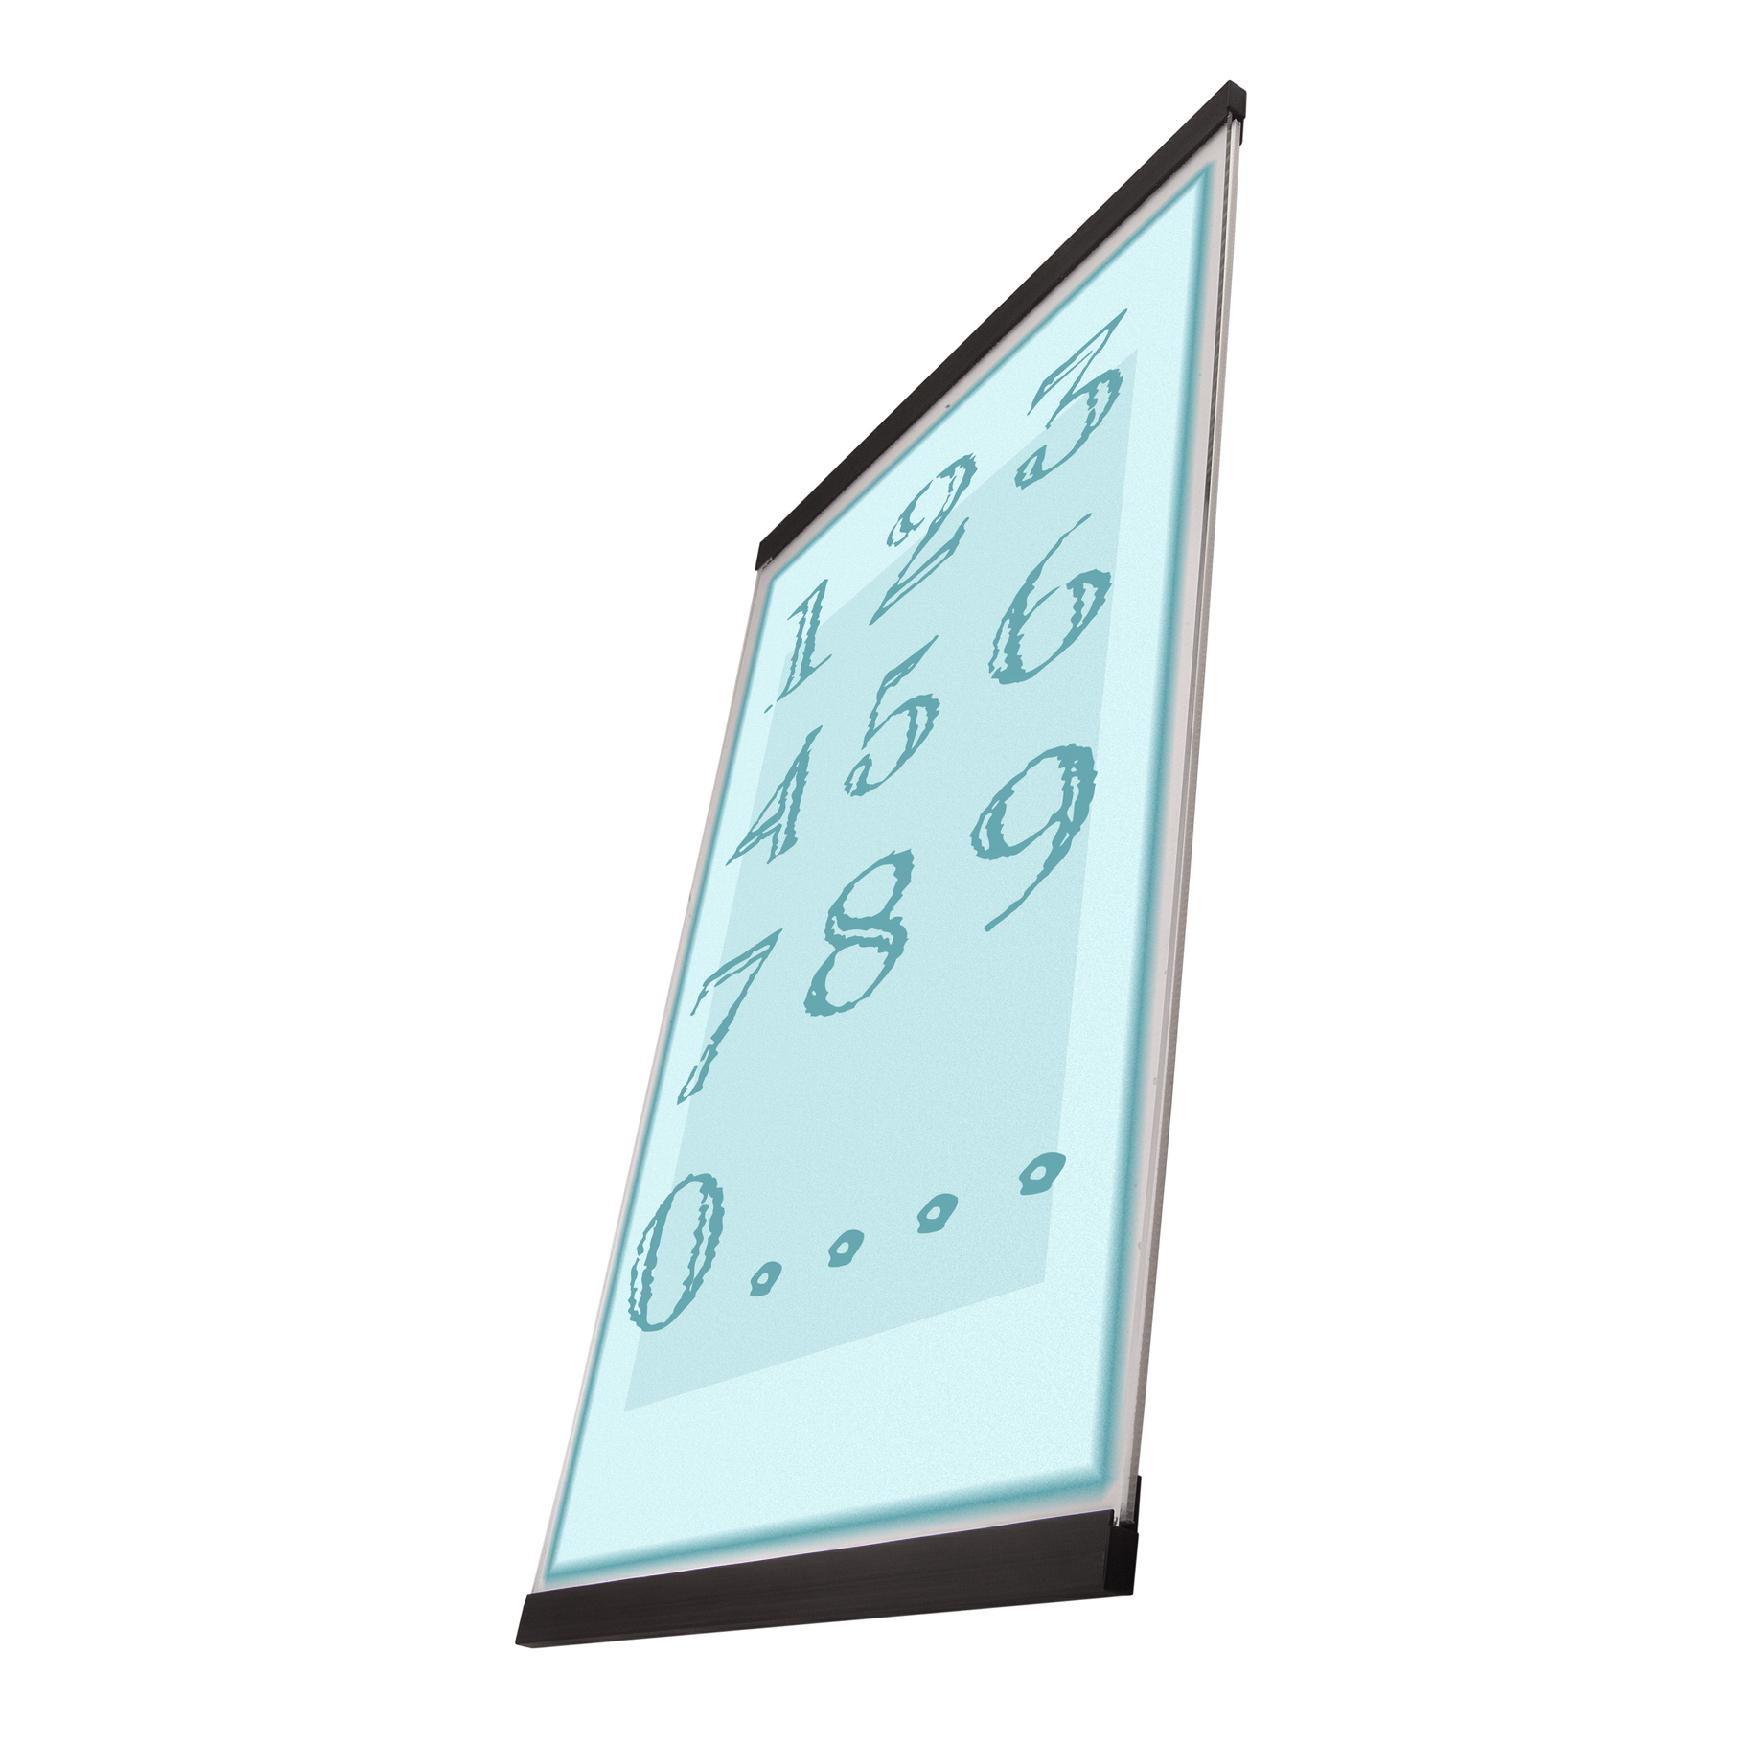 Meuble Salle De Bain Pas Cher Lyon ~ catalogo gedel gesiplast